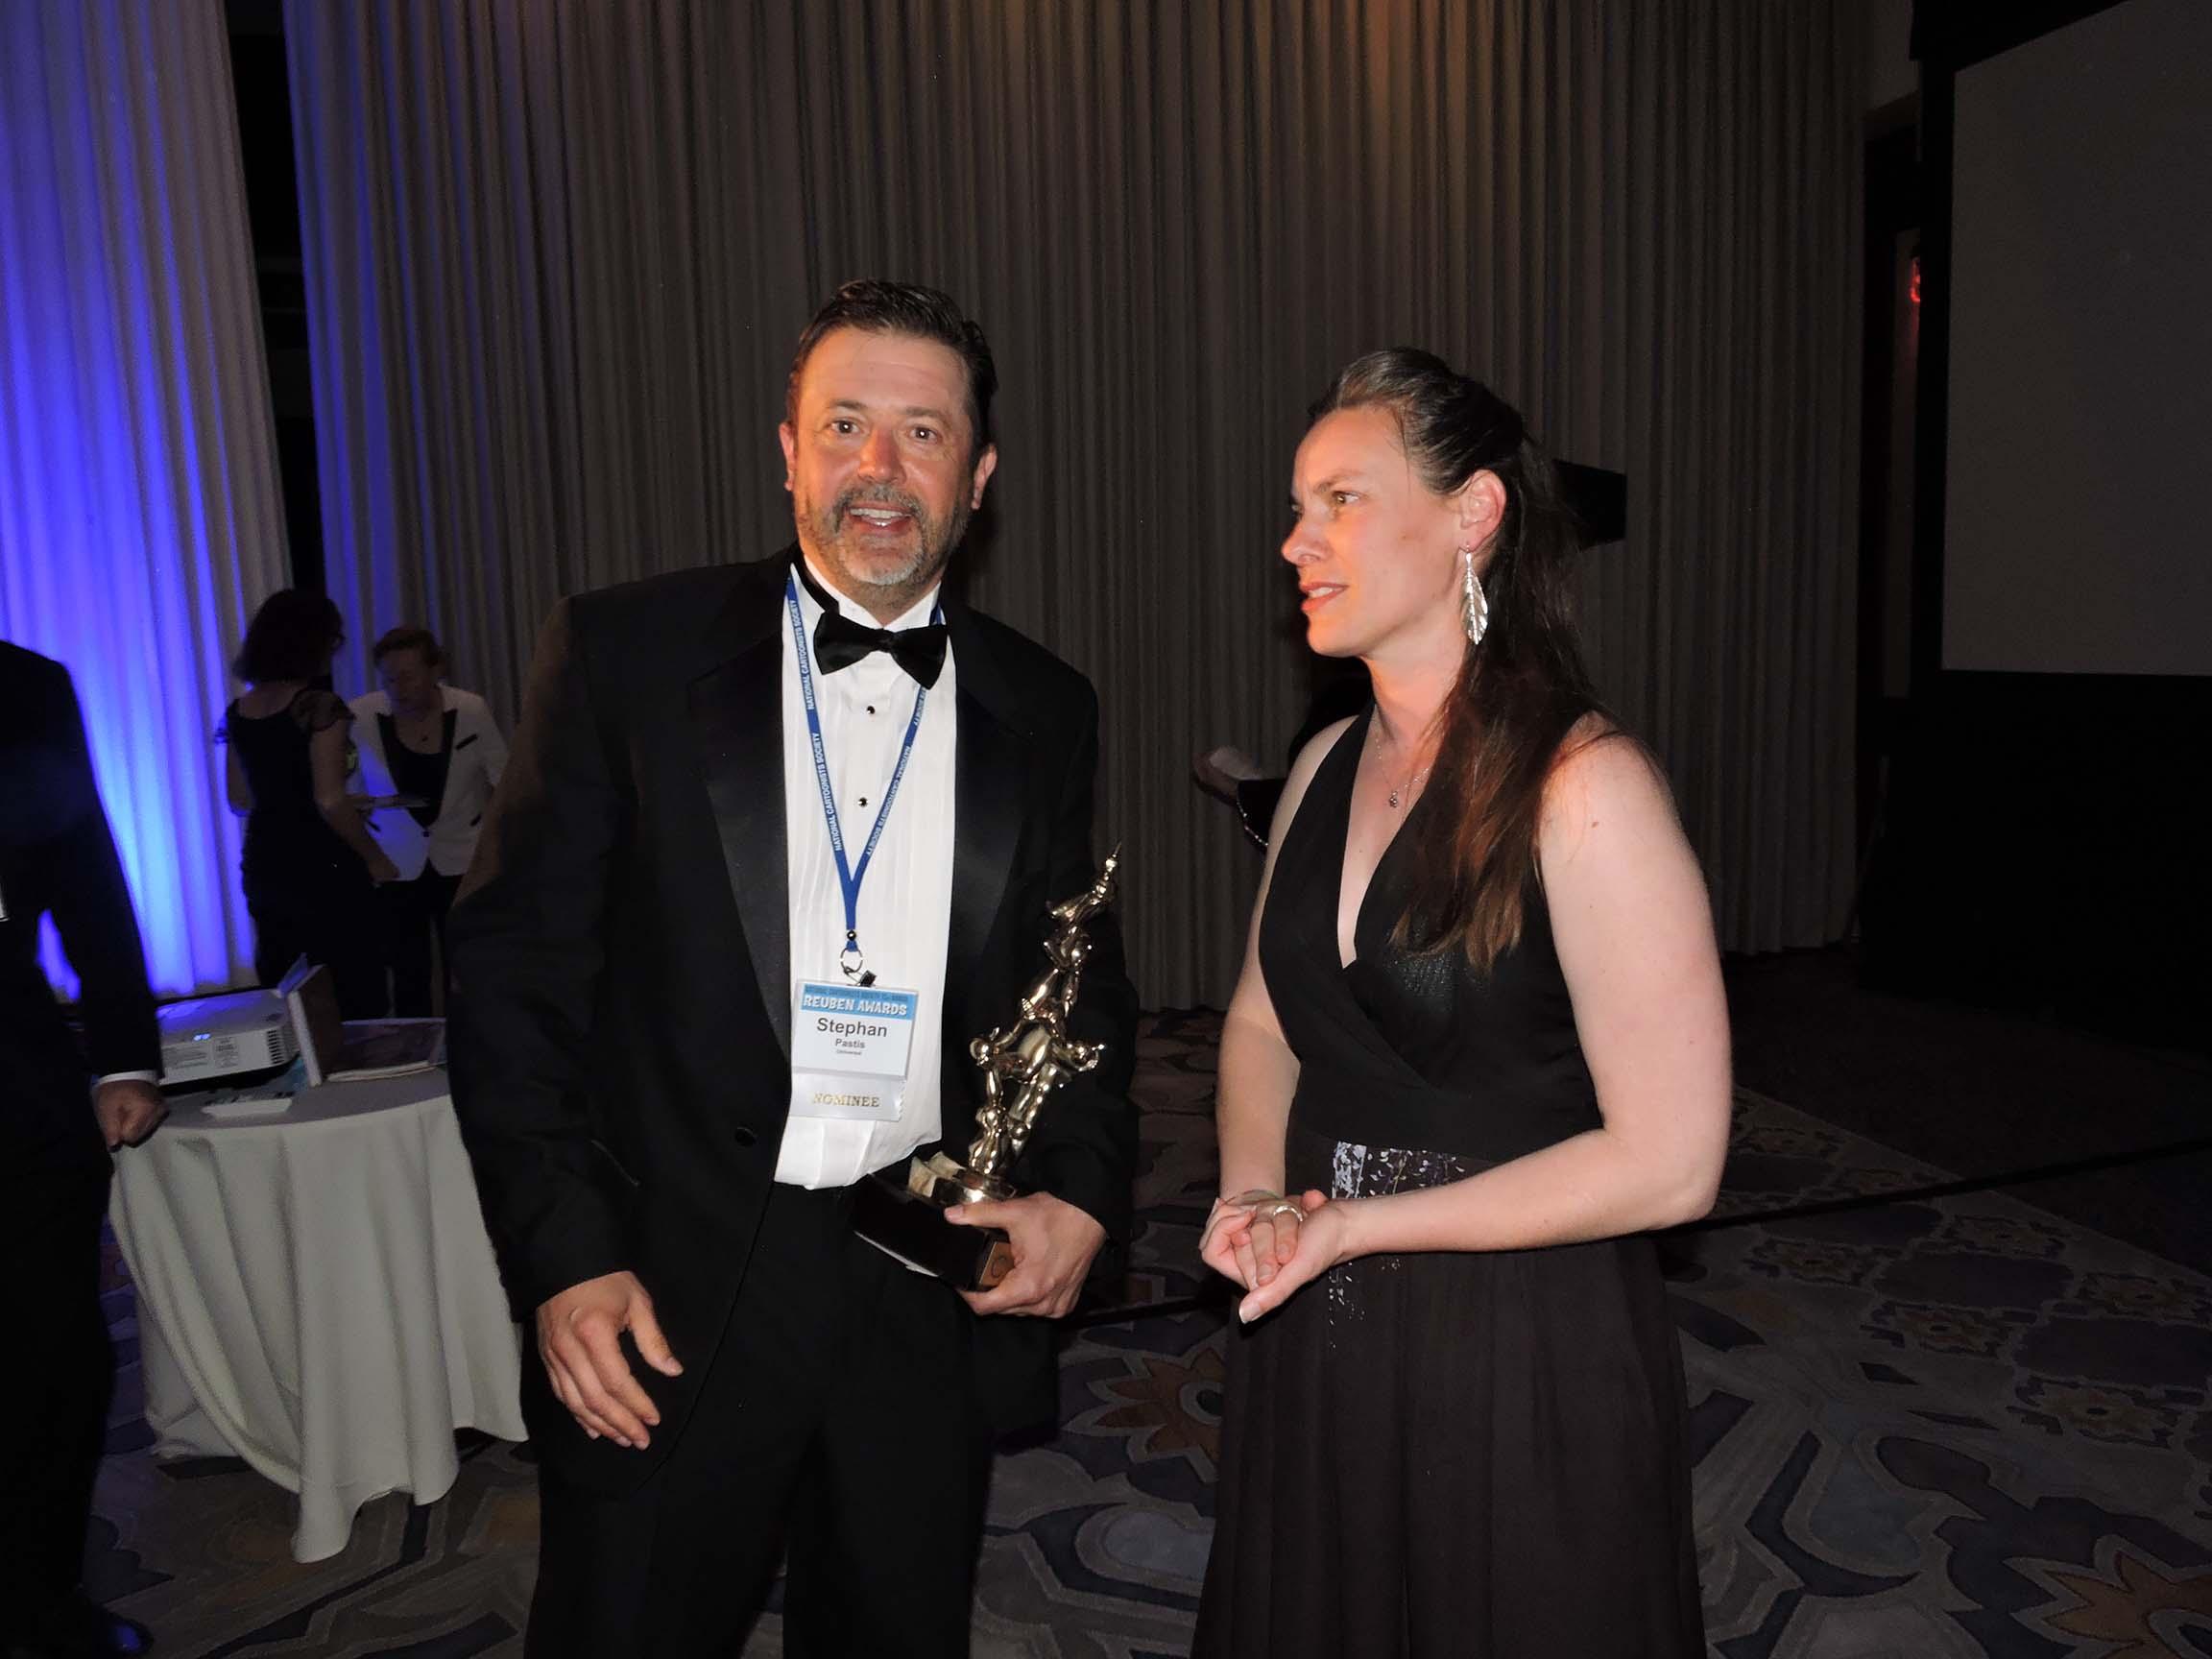 Stephan Pastis and Karen Evans